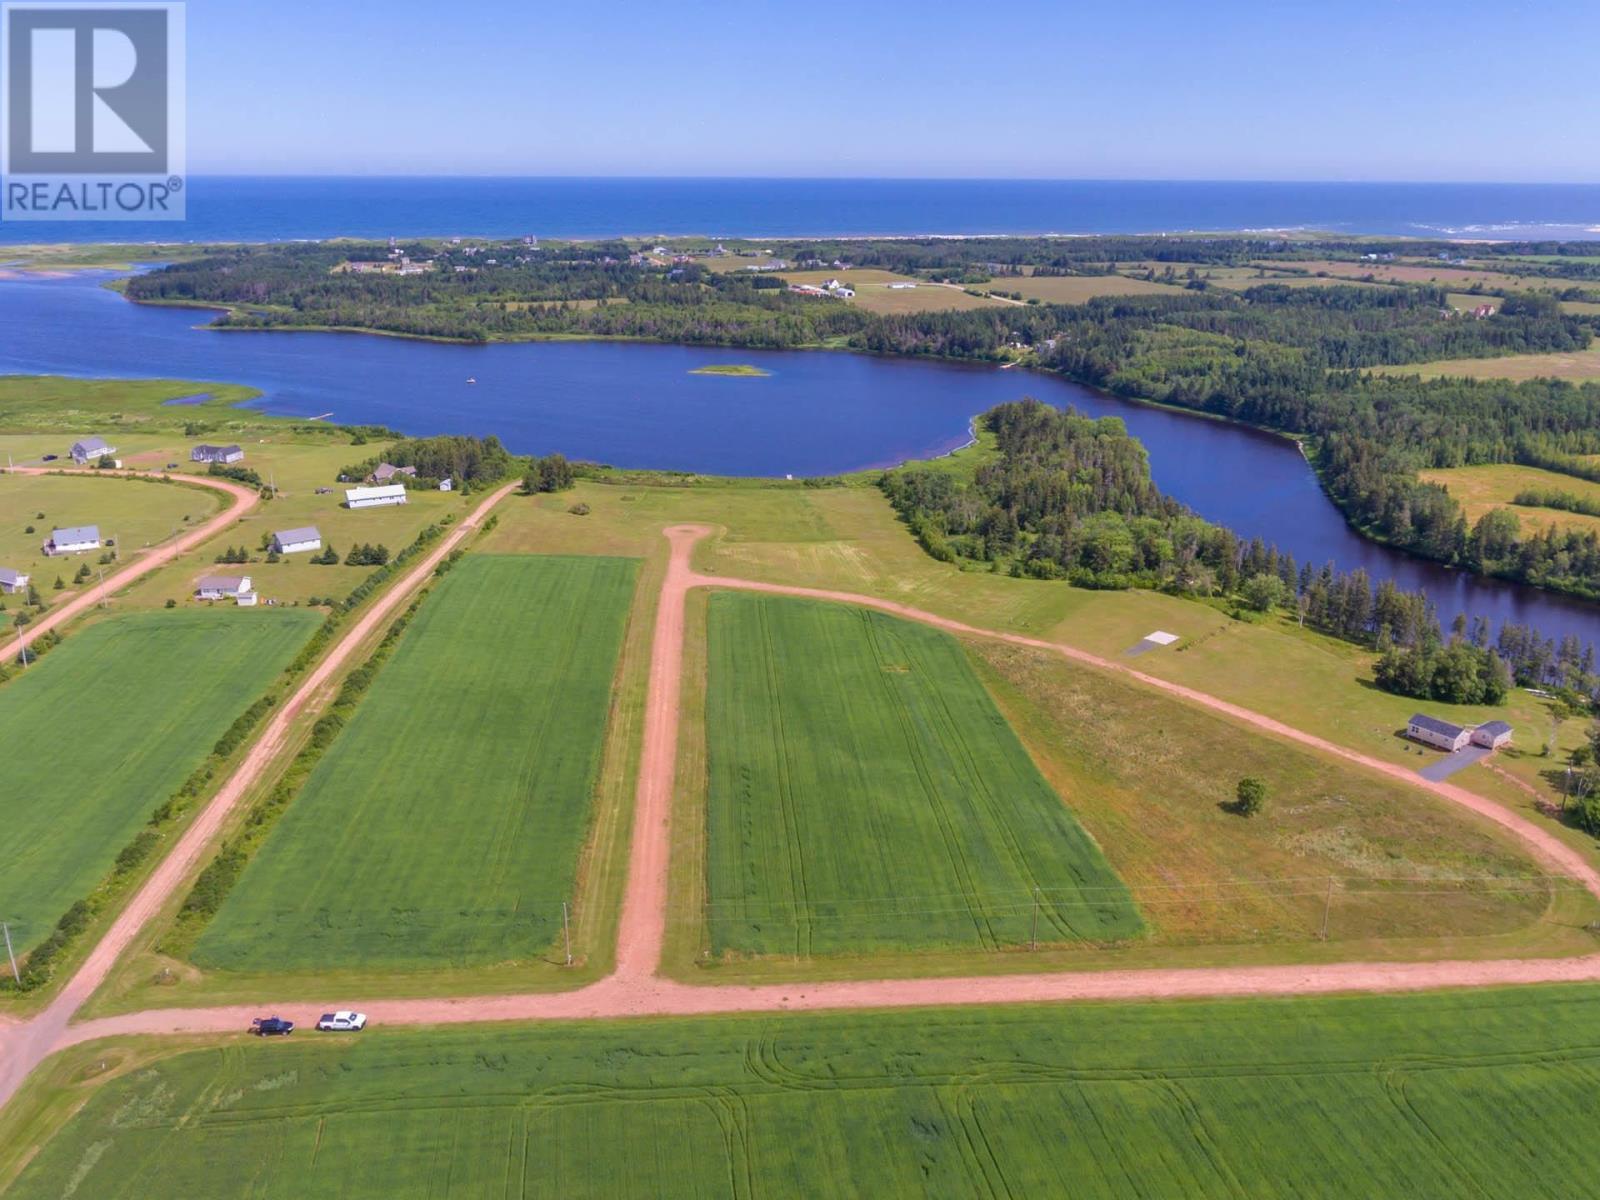 Lot 2 Majestic View Lane, Lakeside, Prince Edward Island  C0A 1S0 - Photo 2 - 202118512